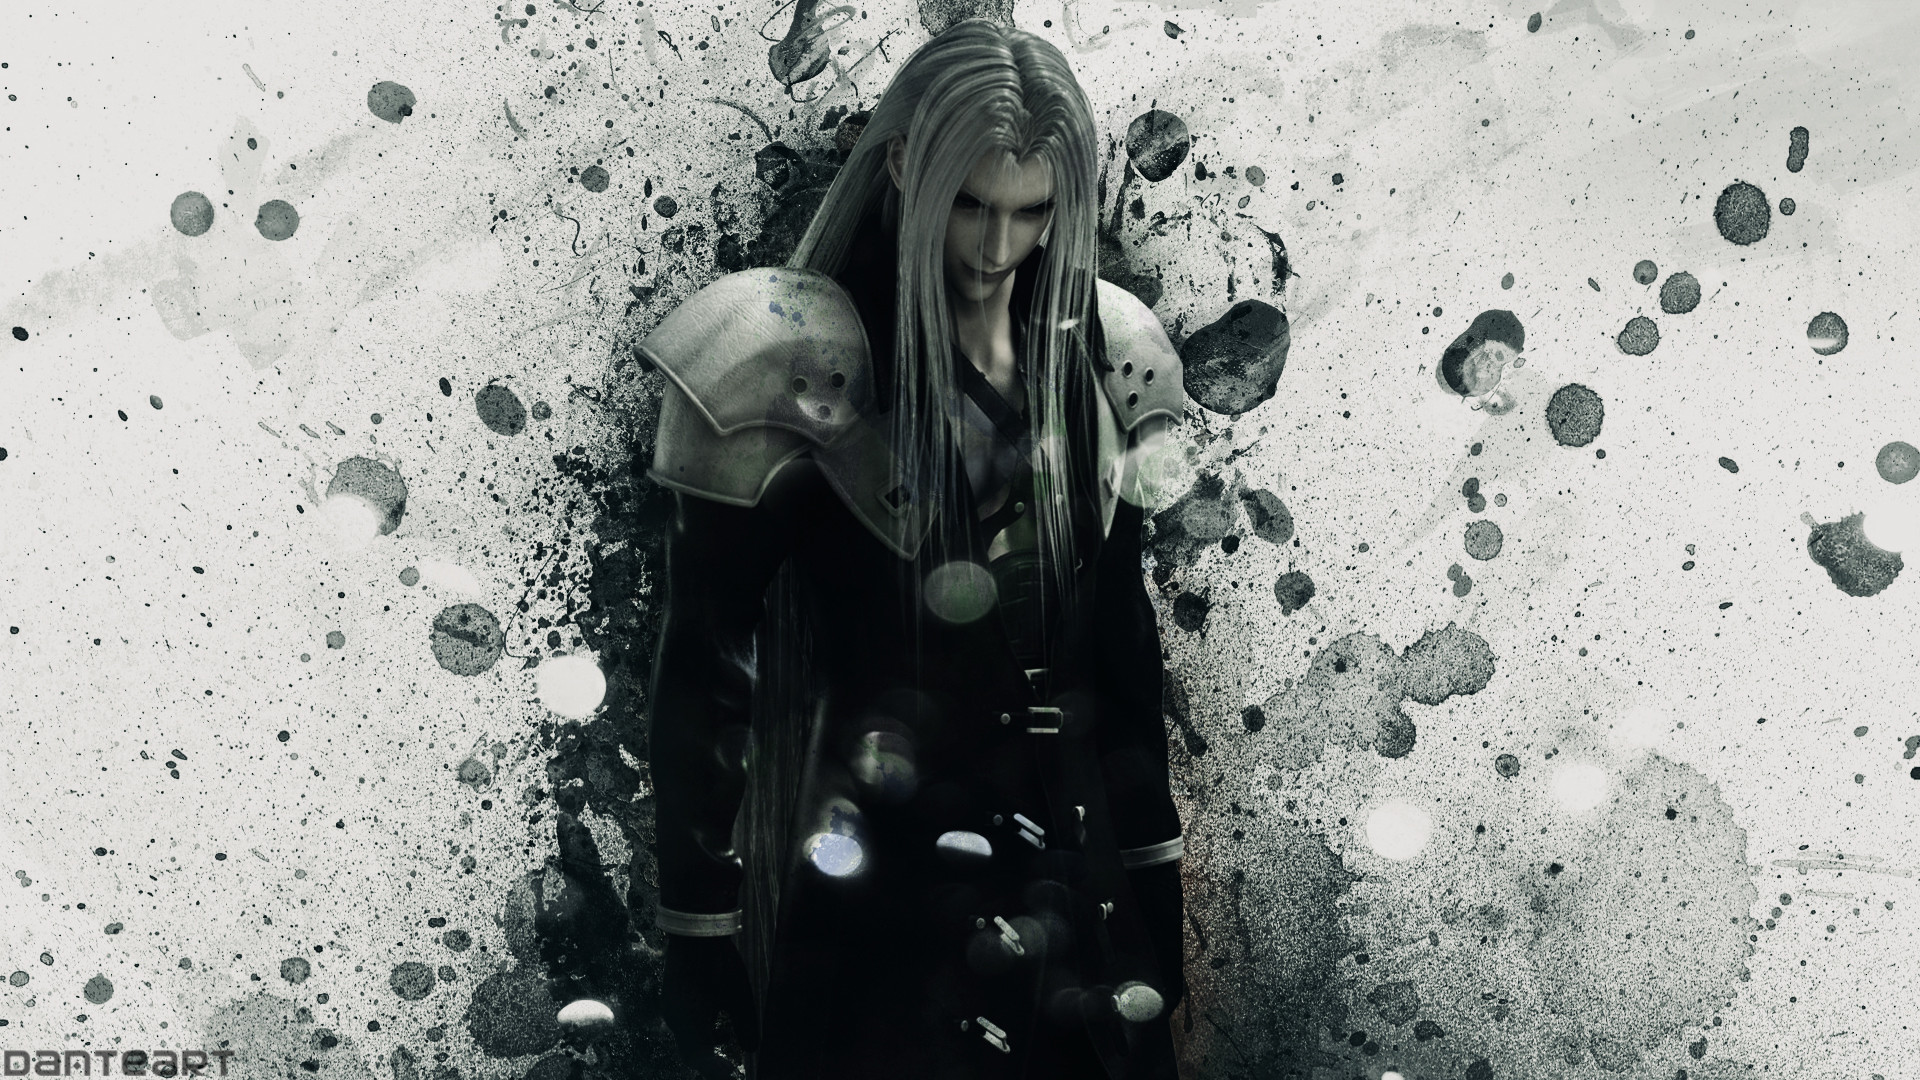 Final Fantasy 7 Sephiroth Wallpaper Wallpapertag